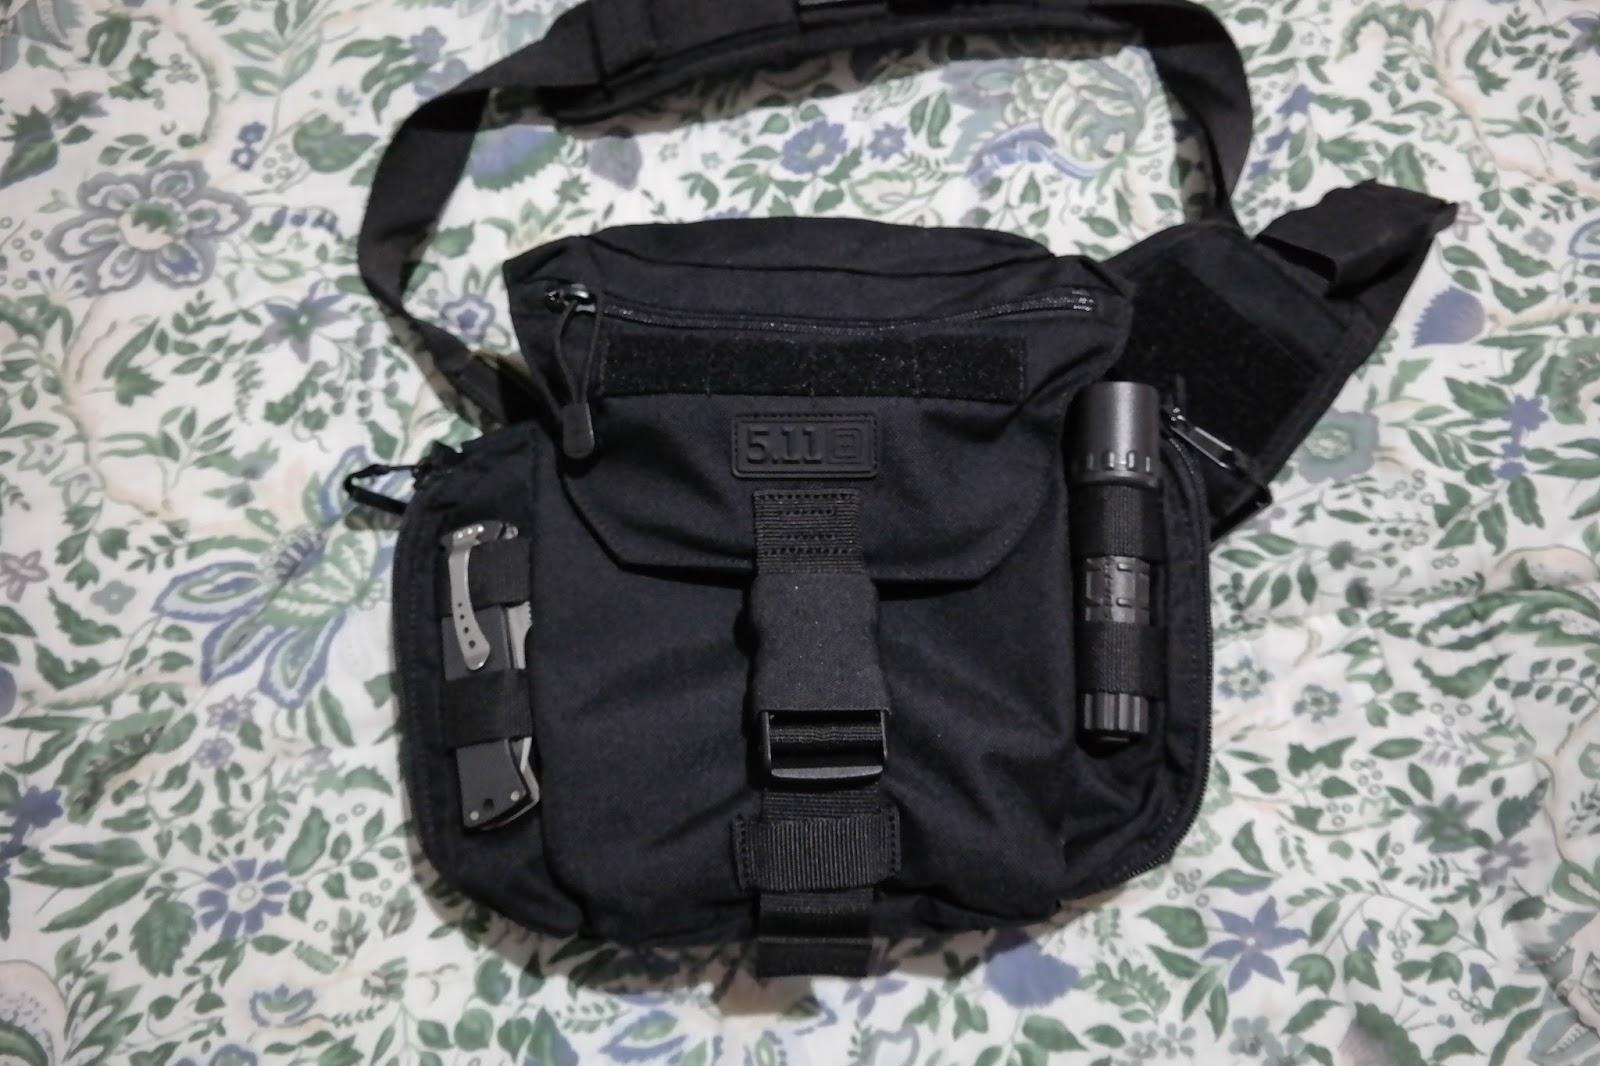 ceae155f25 5.11 PUSH Pack - Το Πρακτικό Σακίδιο Ώμου Γενικής Χρήσης